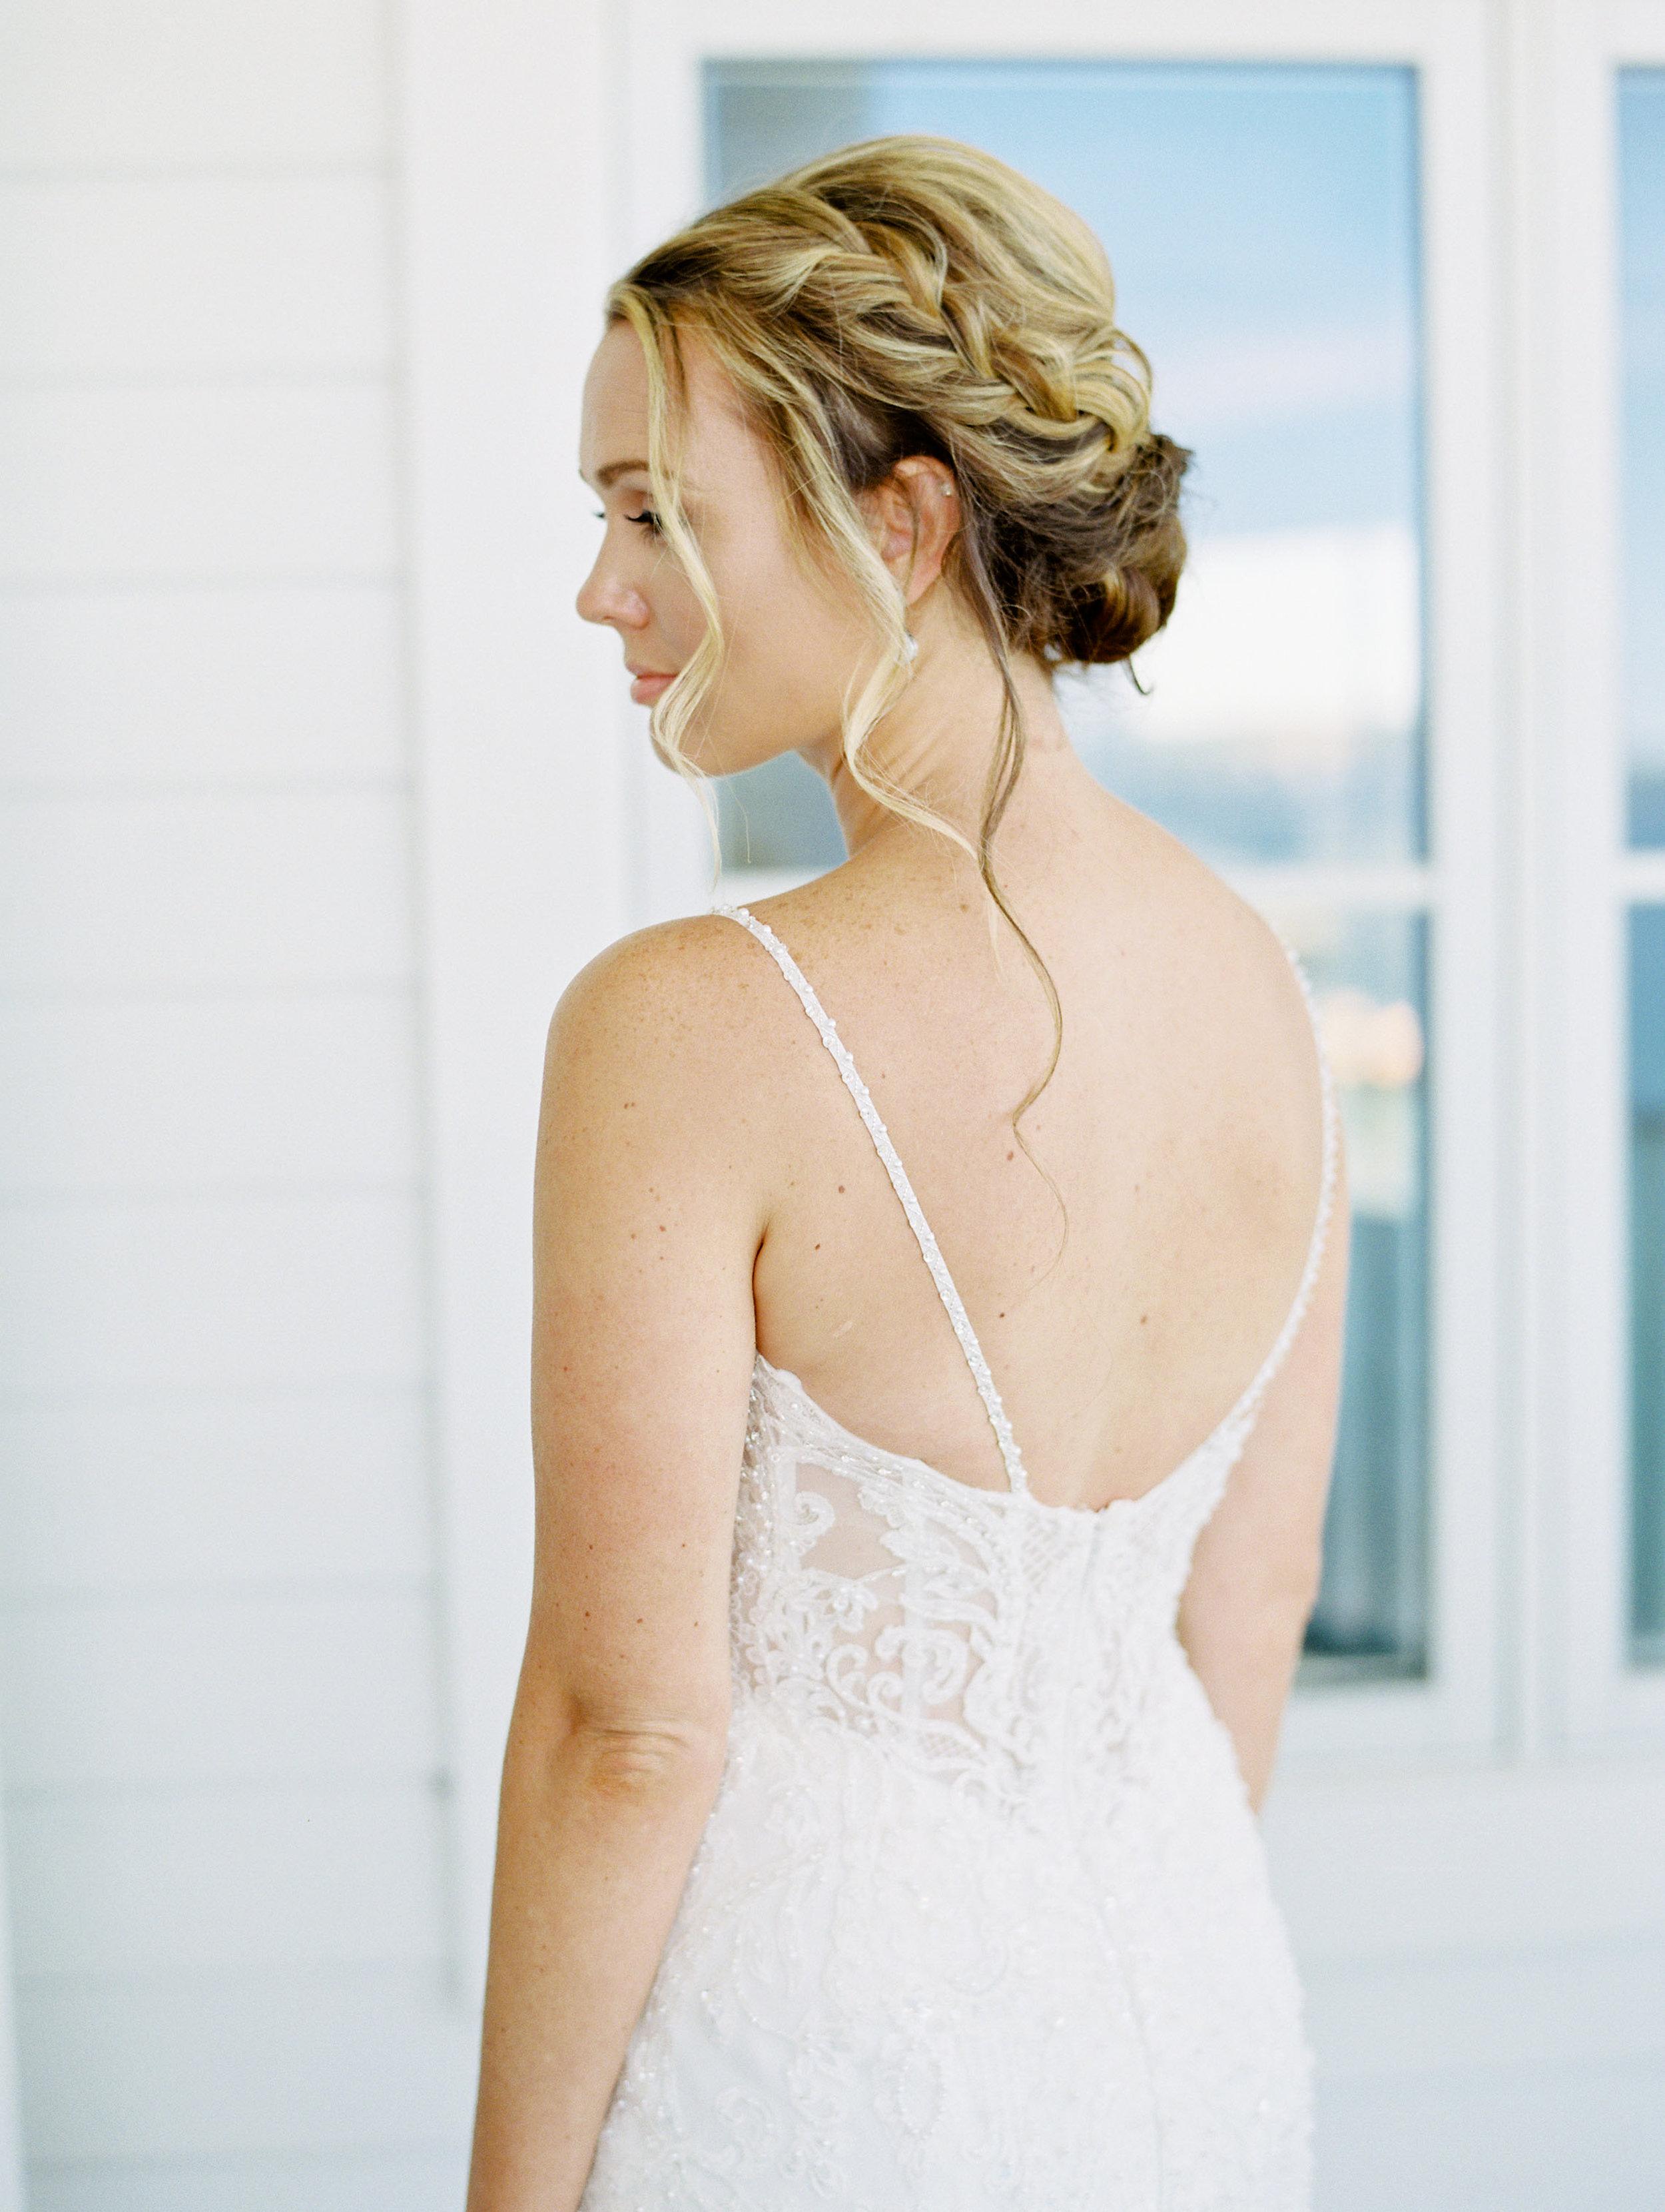 Noss+Wedding+Getting+Ready-141.jpg